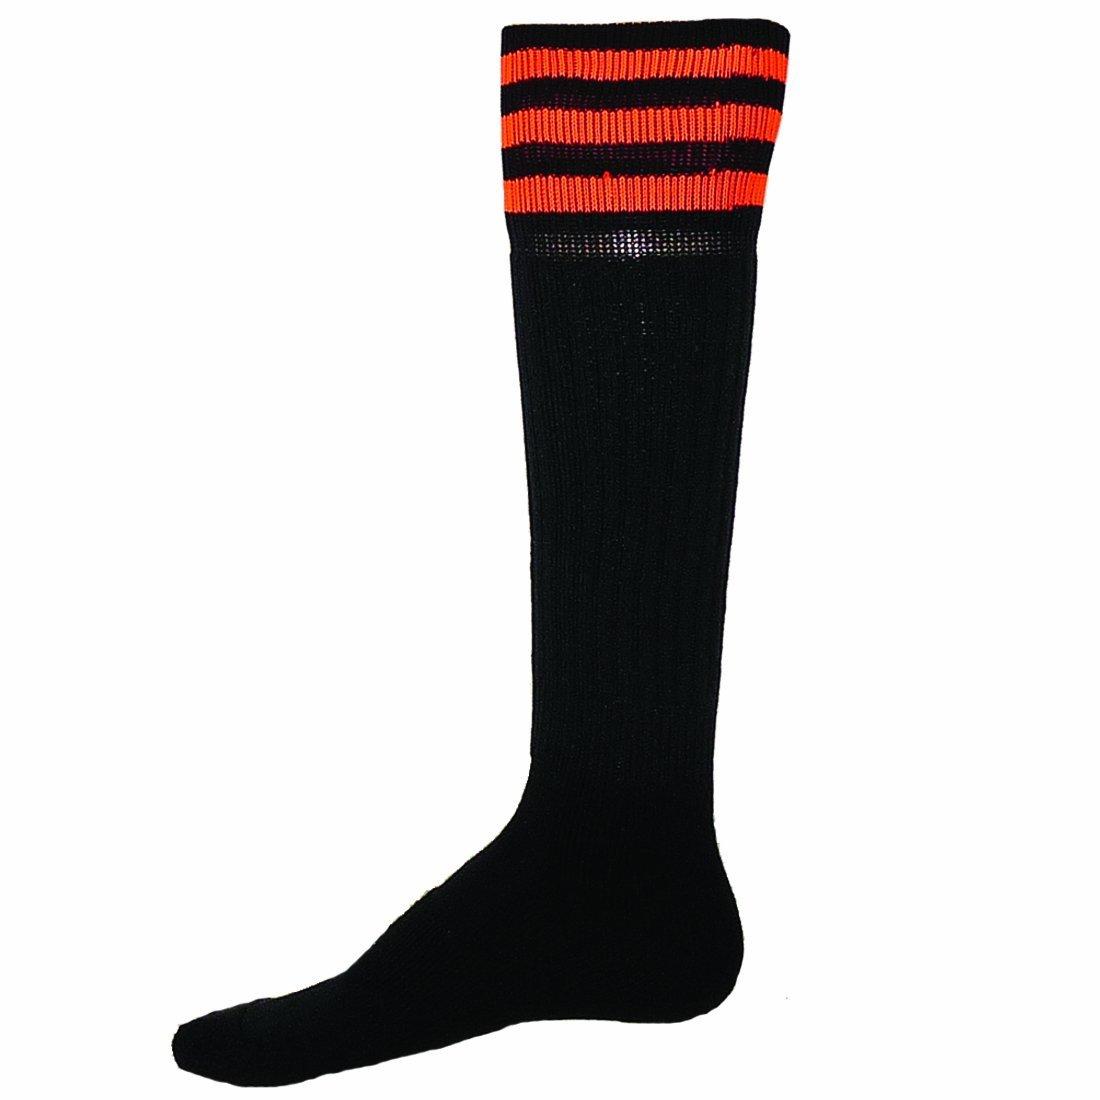 Red Lion Mach III Athletic Sport Wear High Knee Socks ( Black / Neon Orange - Medium )